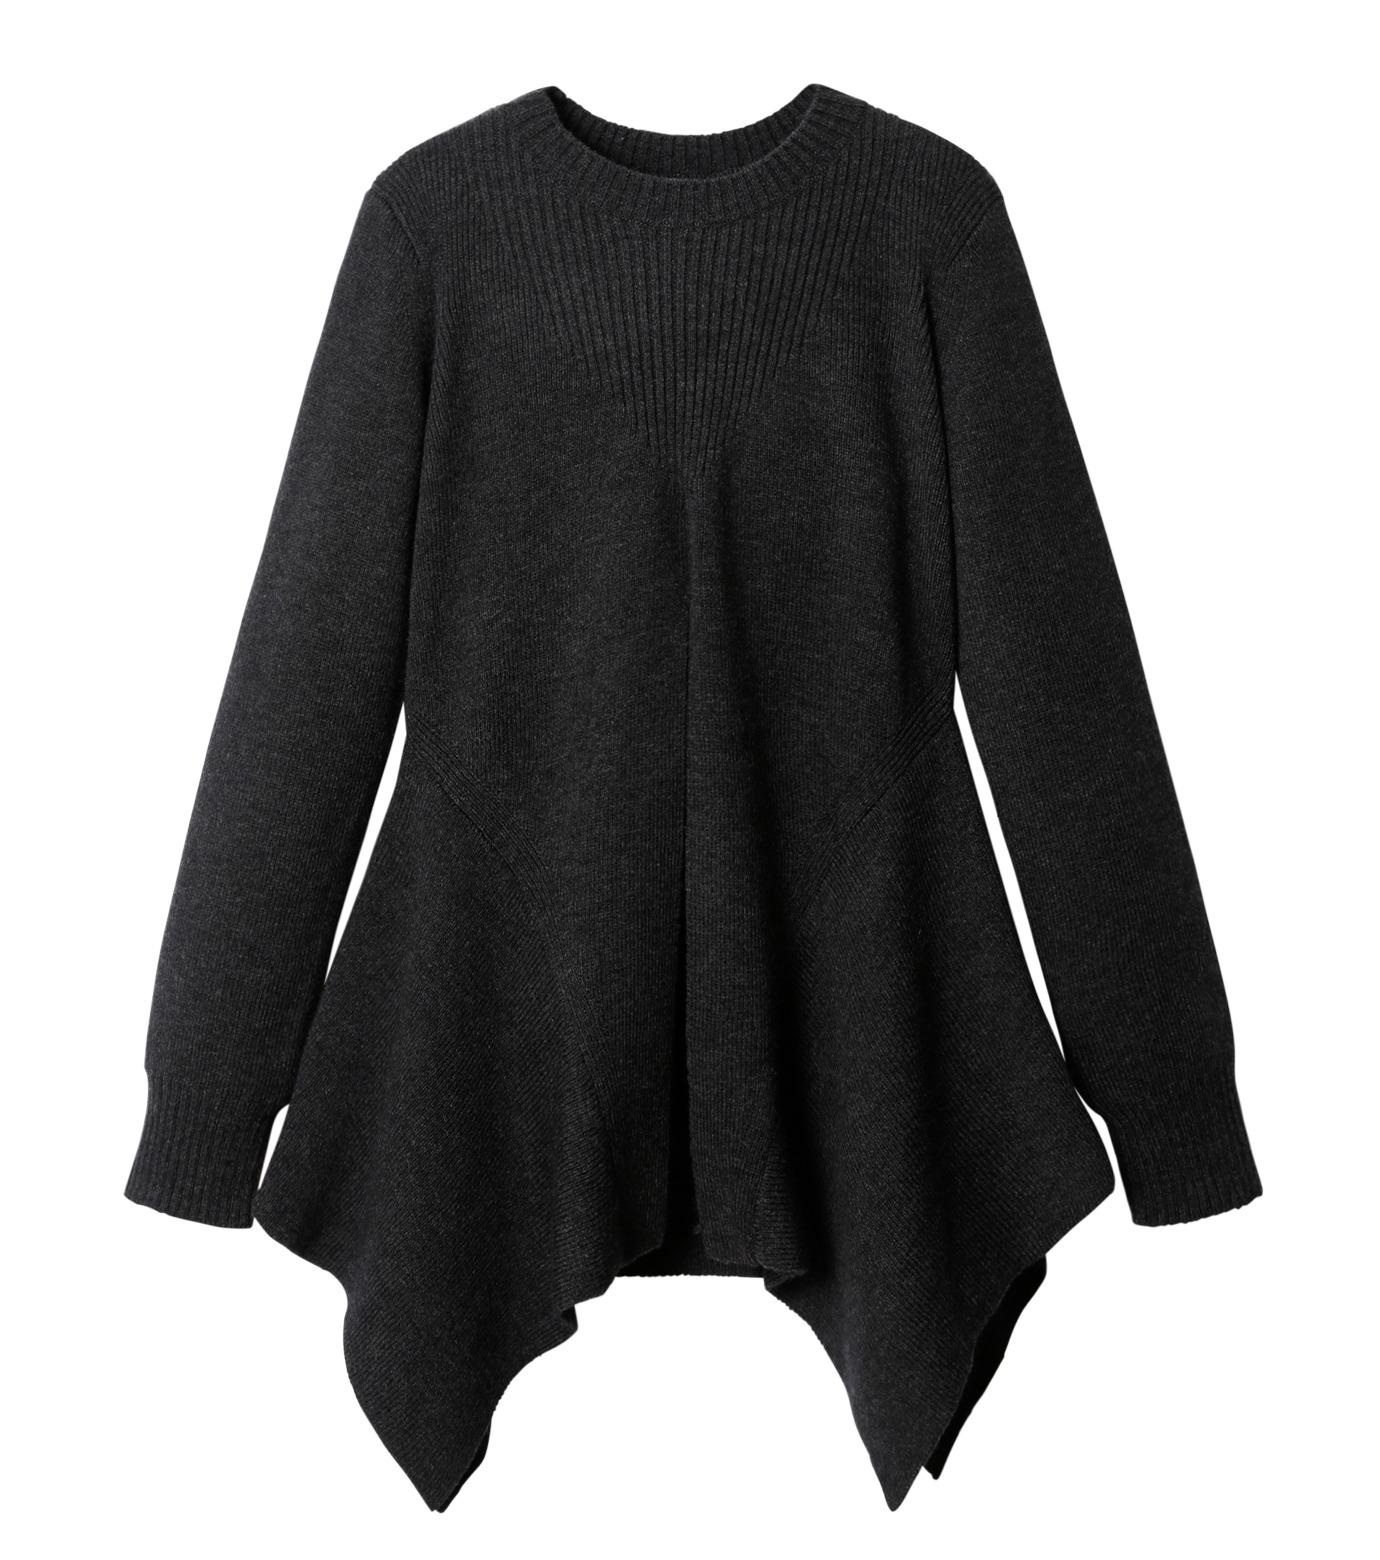 AKANE UTSUNOMIYA(アカネウツノミヤ)のAsymmetry Knit Pullover-BLACK(ニット/knit)-W16FK221010-13 拡大詳細画像1